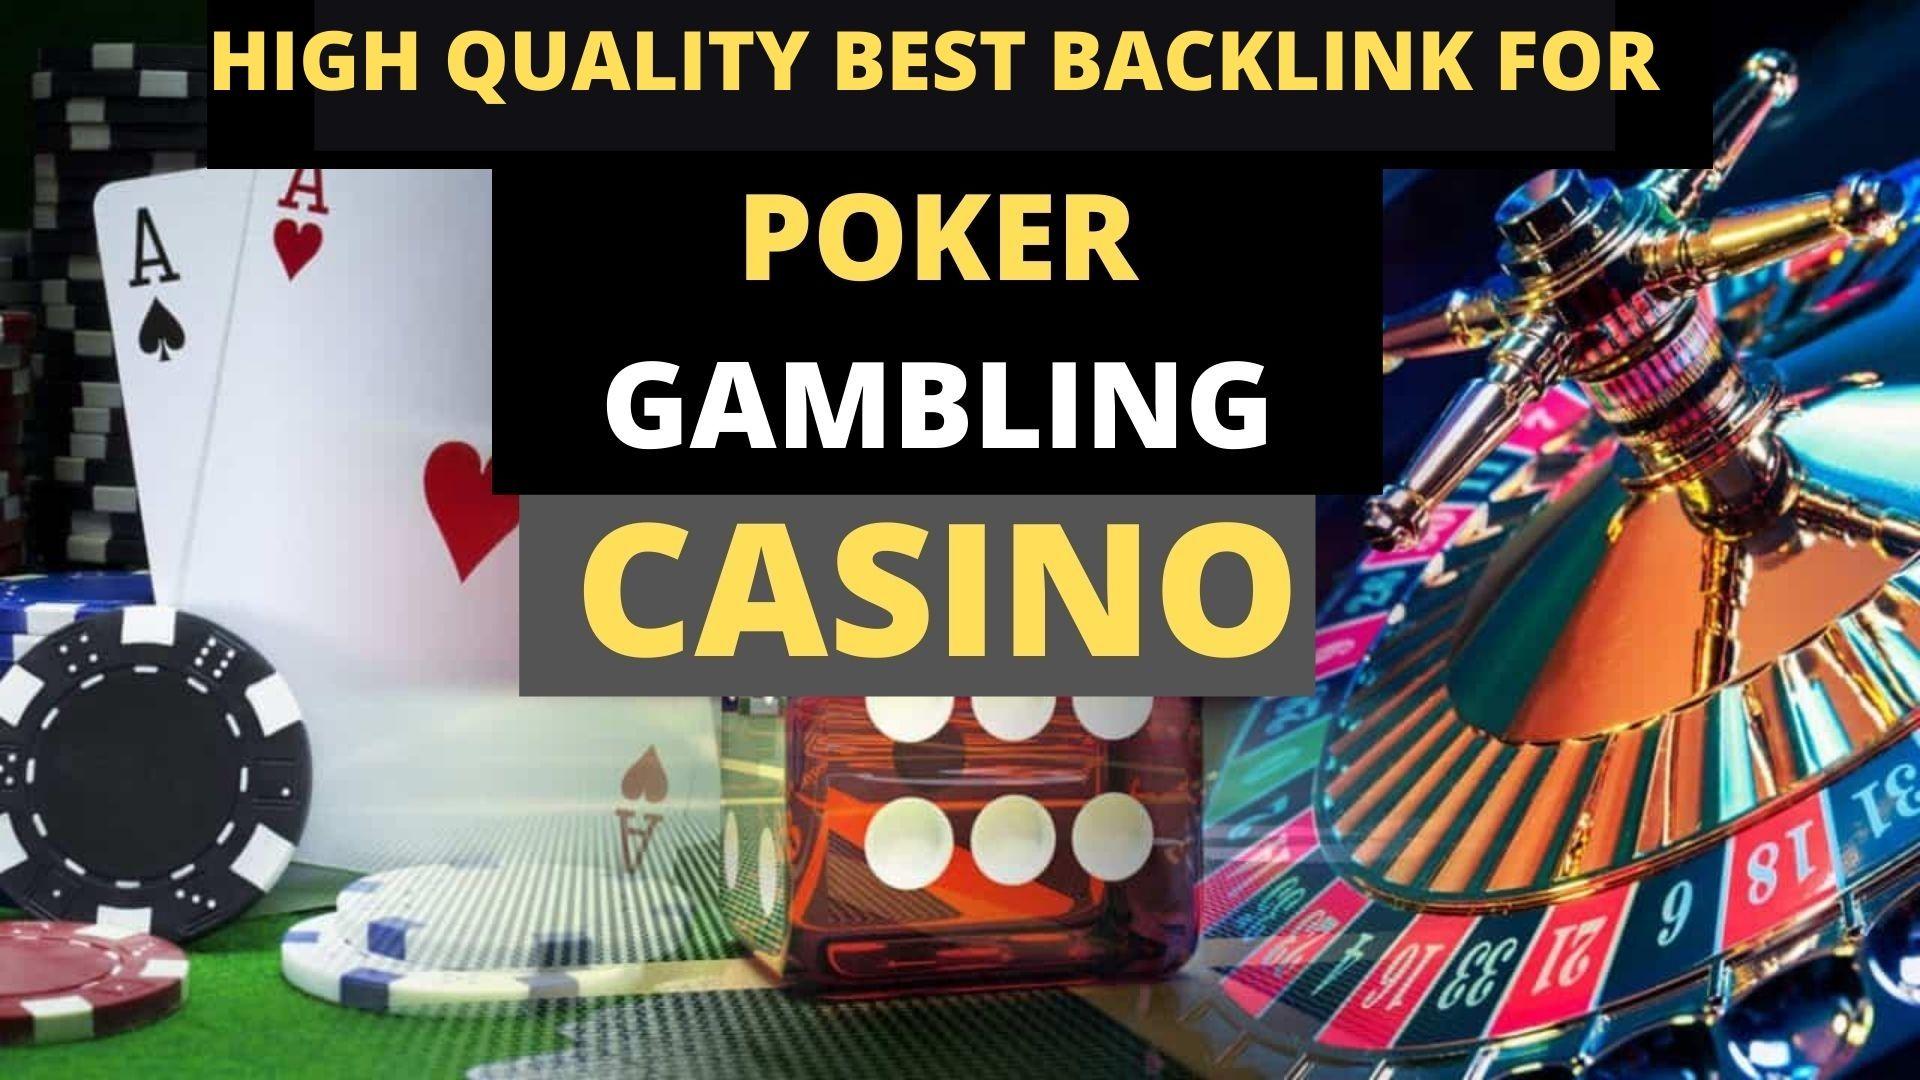 5 PBN Backlinks Permanent Poker Gambling Casino Websites